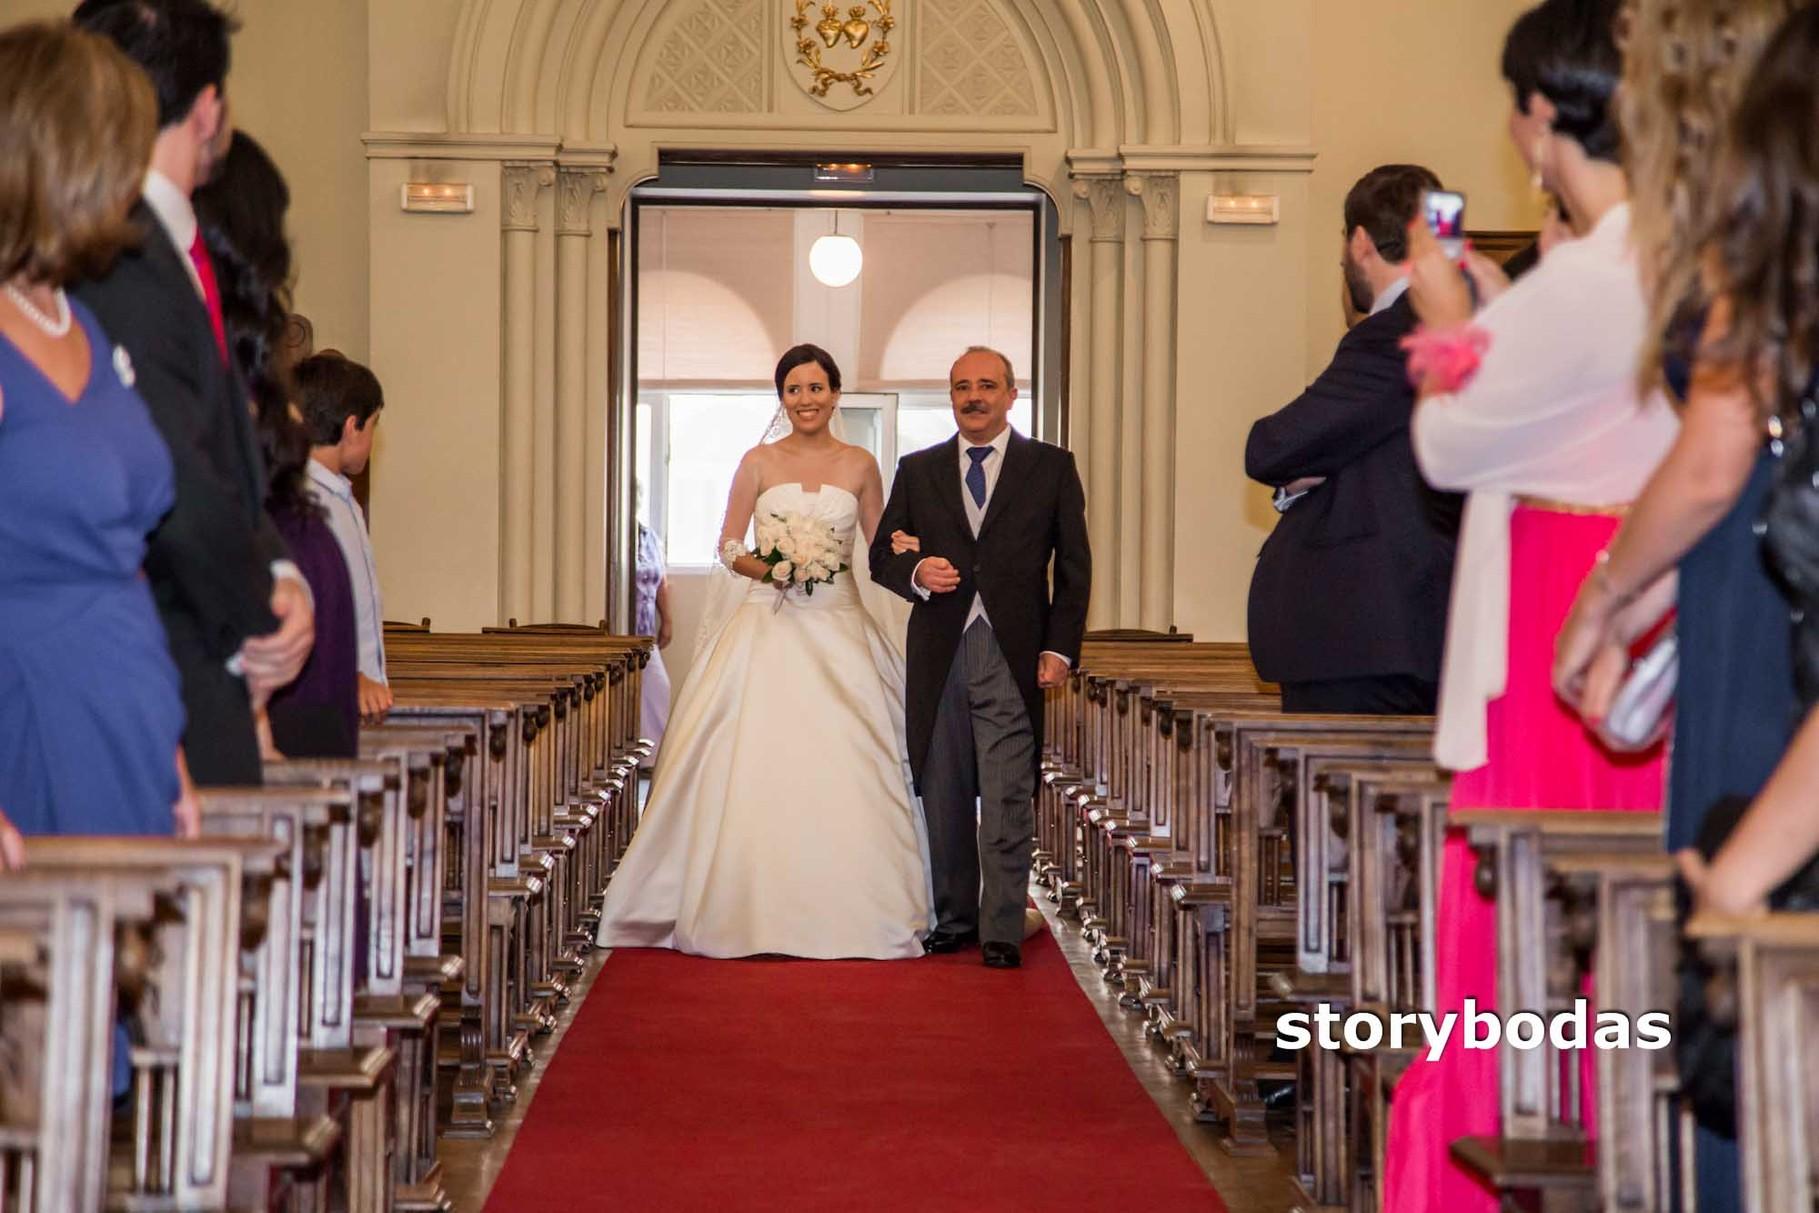 storybodas Llega la novia a la Ceremonia